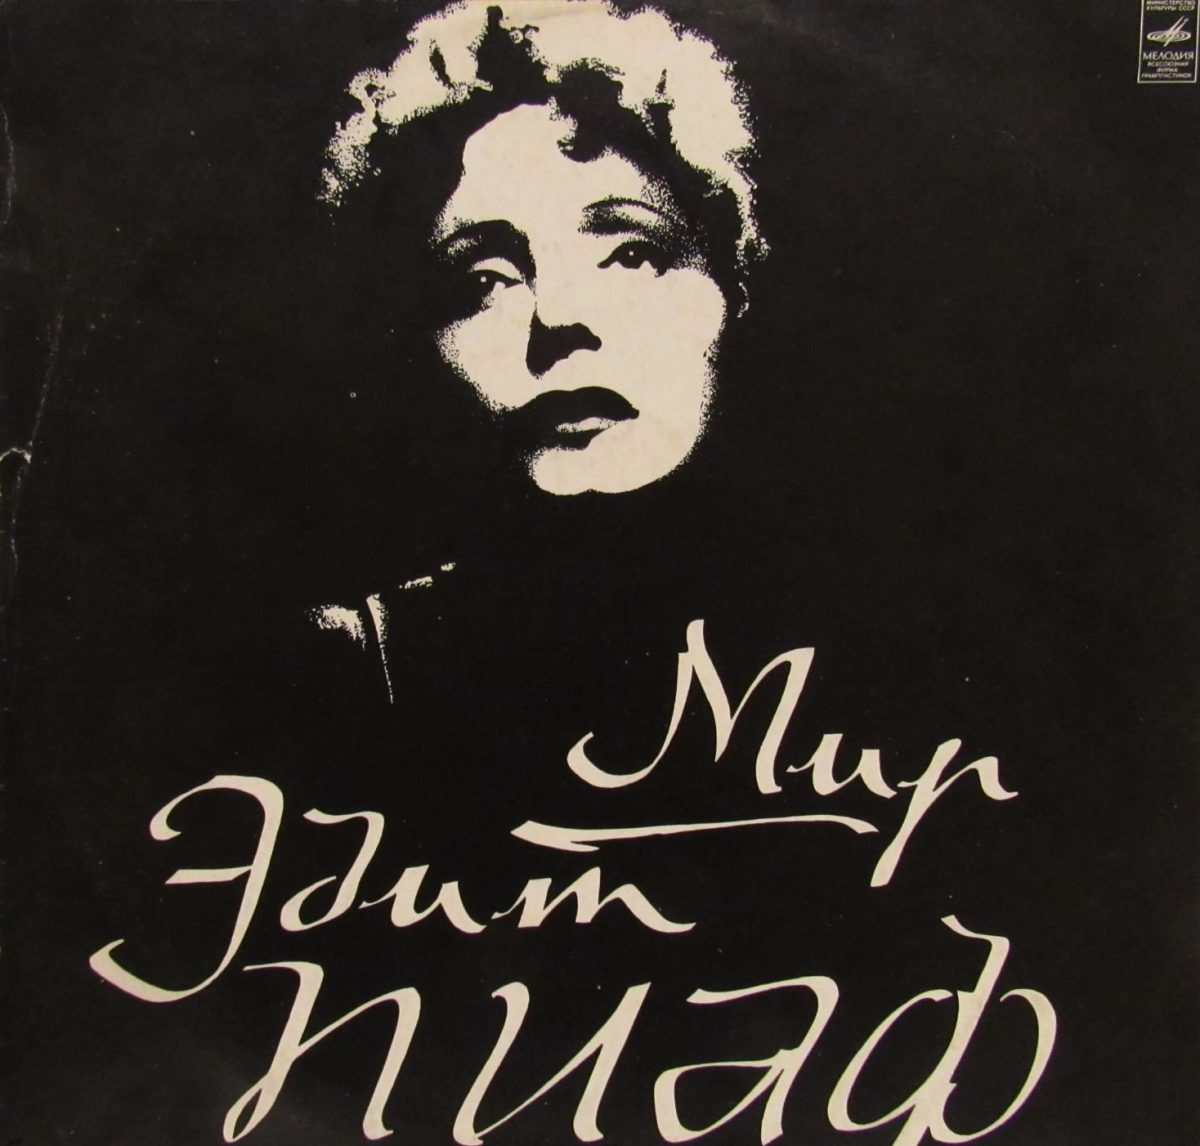 Edith Piaf Magyarországon?